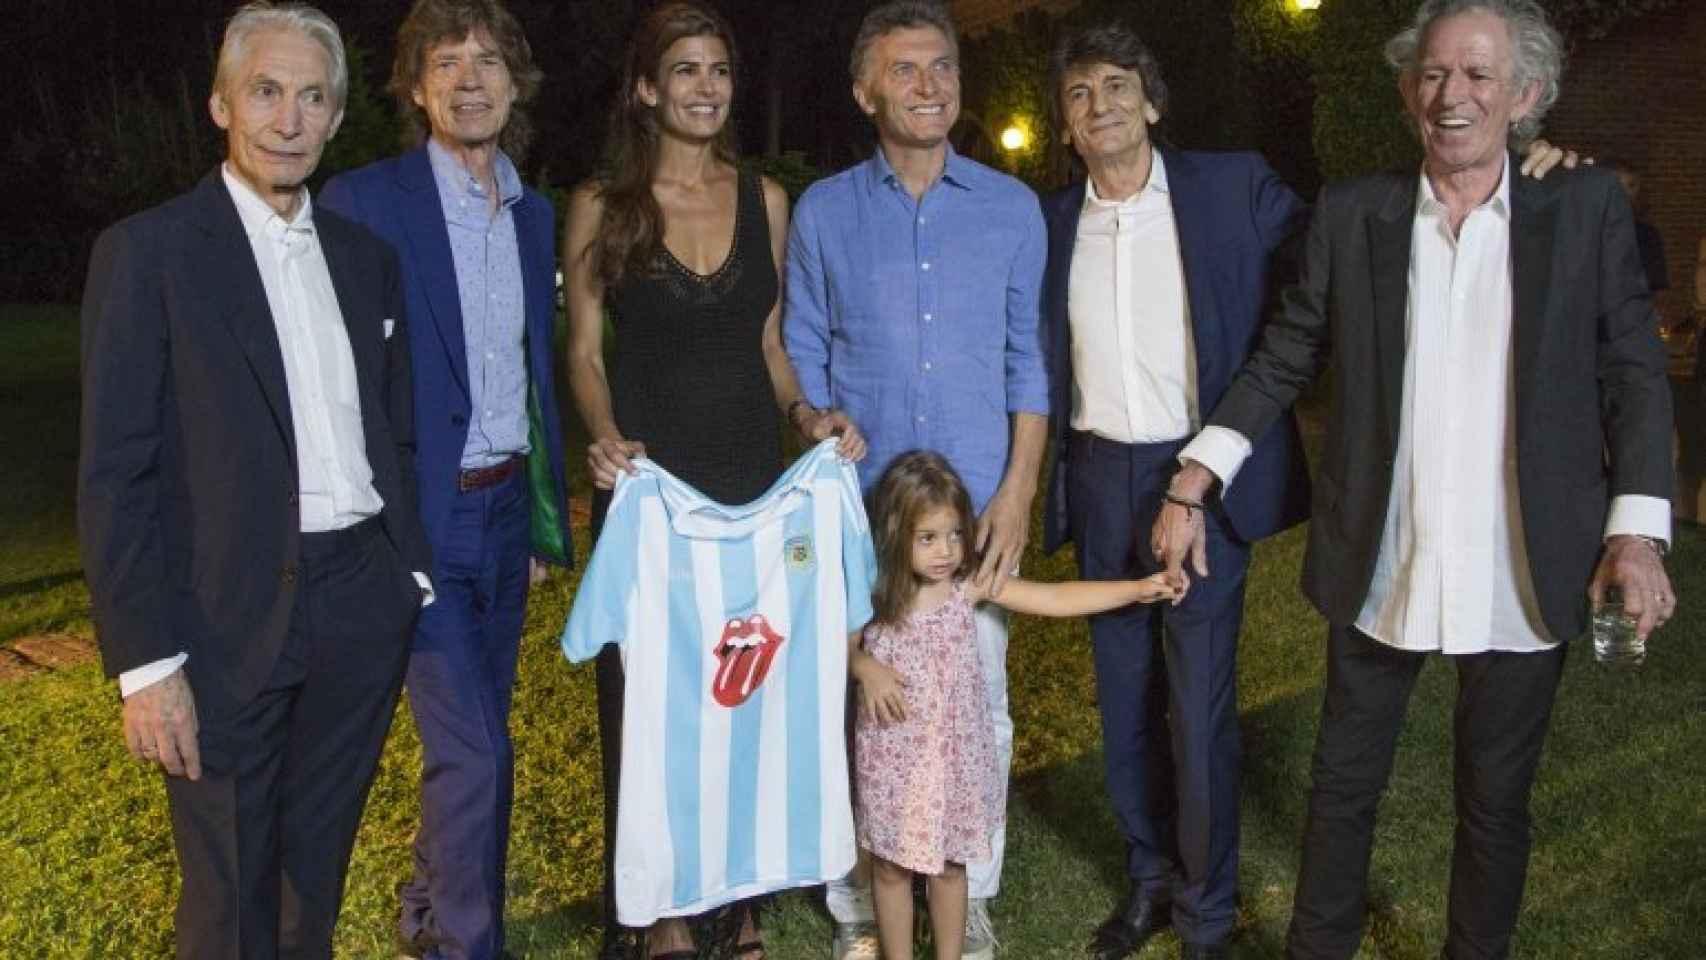 Juliana Awada, su pequeña hija Antonia y Macri junto a Ronnie Wood, Mick Jagger, Charlie Watts y Keith Richards.